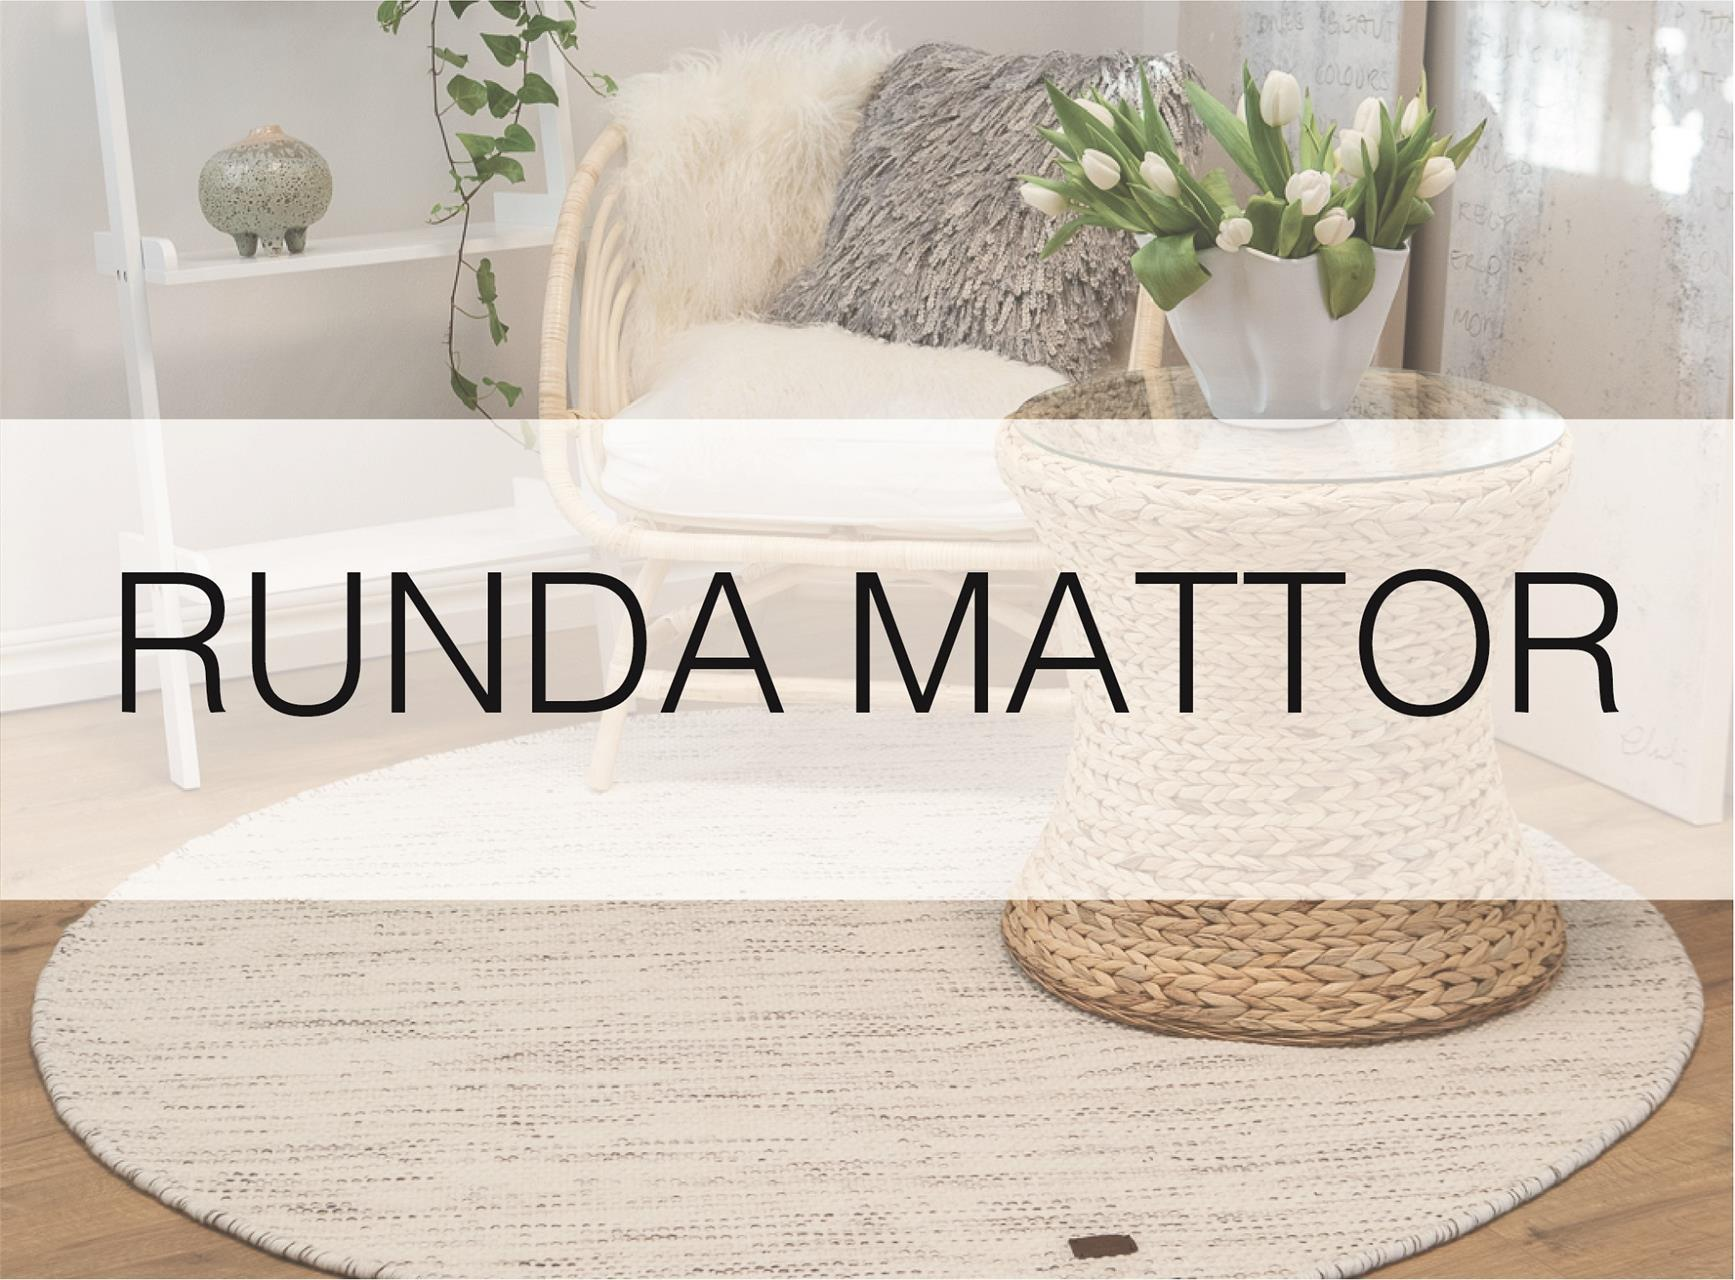 Runda mattor